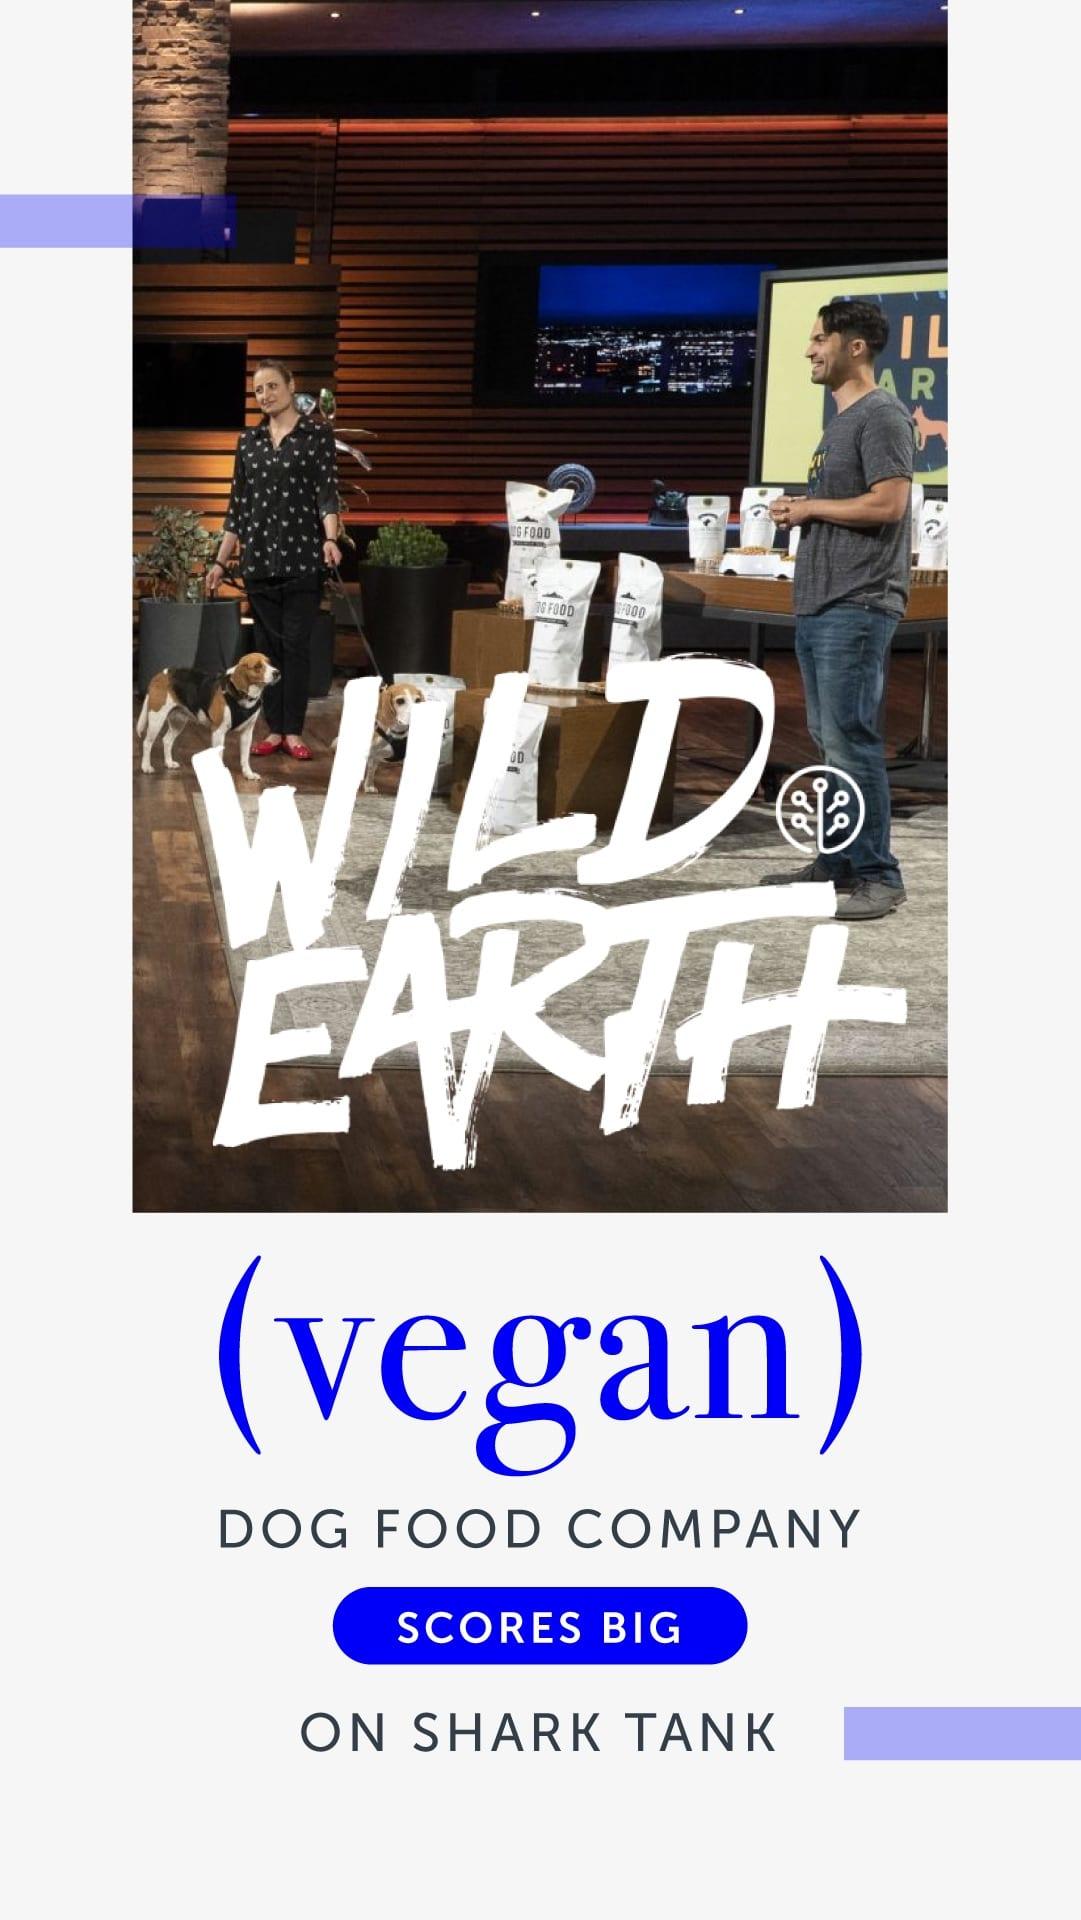 Vegan Dog Food Company Wild Earth Scores Big on Shark Tank